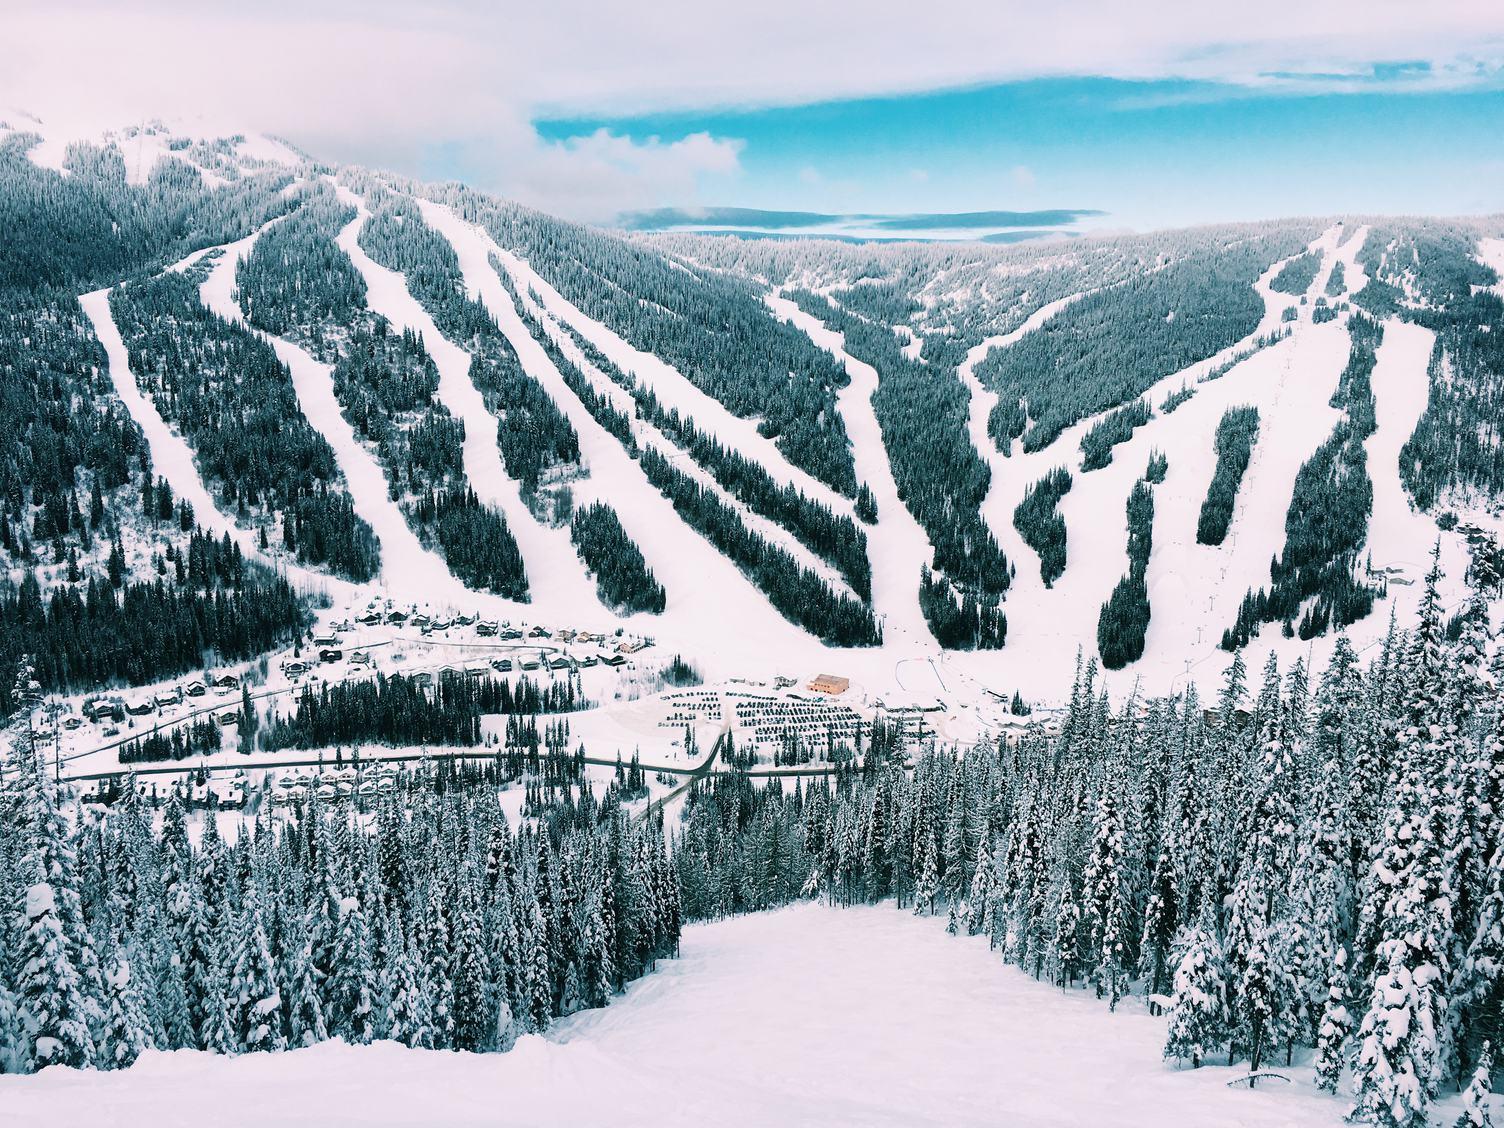 Canada's Alpine Village Sun Peaks Resort